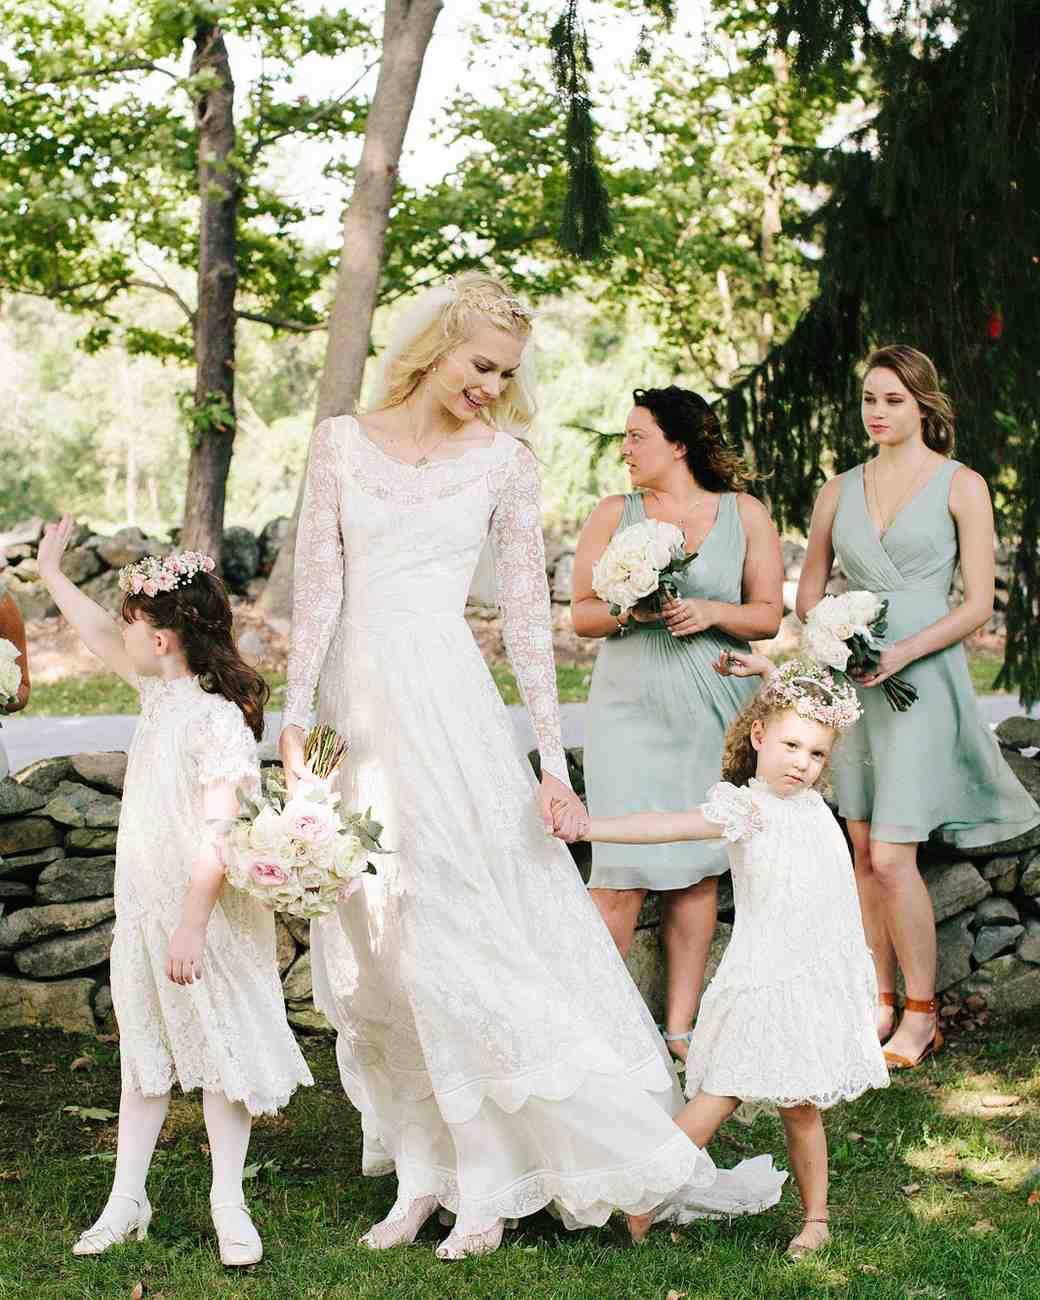 bridal-party-candids-3-0416.jpg